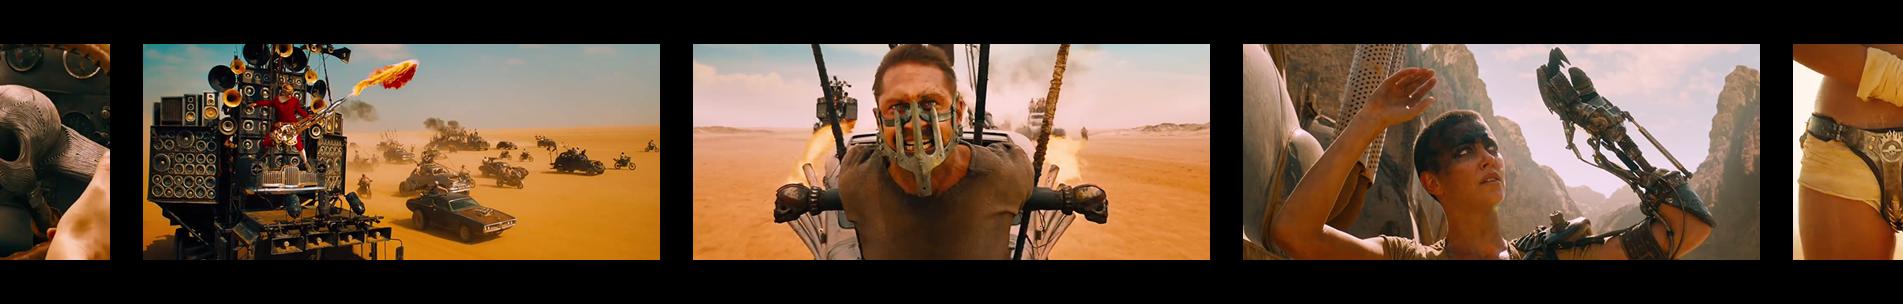 "Pellicule ""Mad Max Fury Road"""